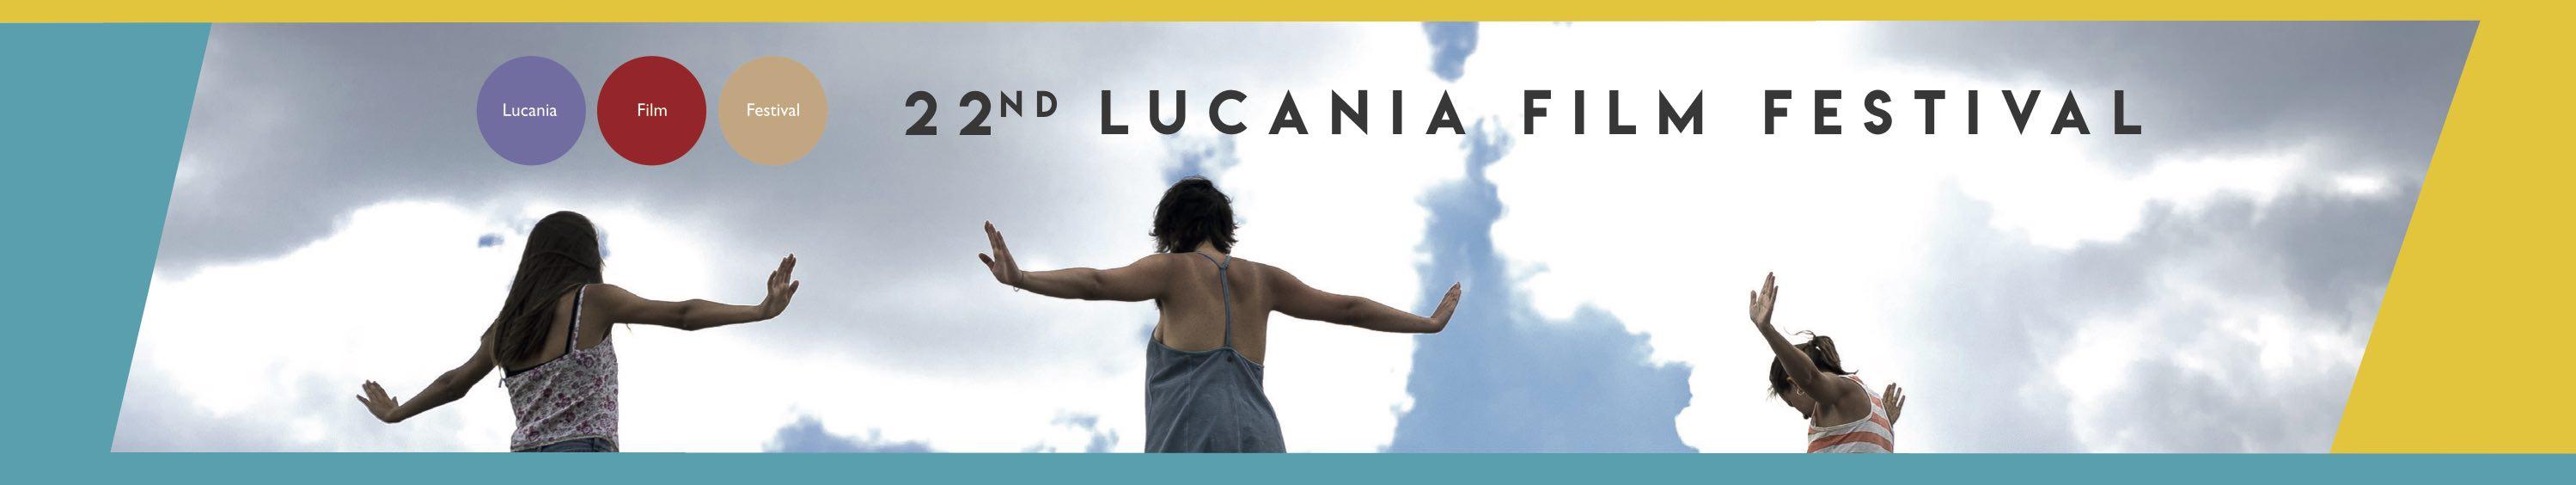 22a Lucania Film Festival · Pisticci · Matera 2019 · Southern Italy